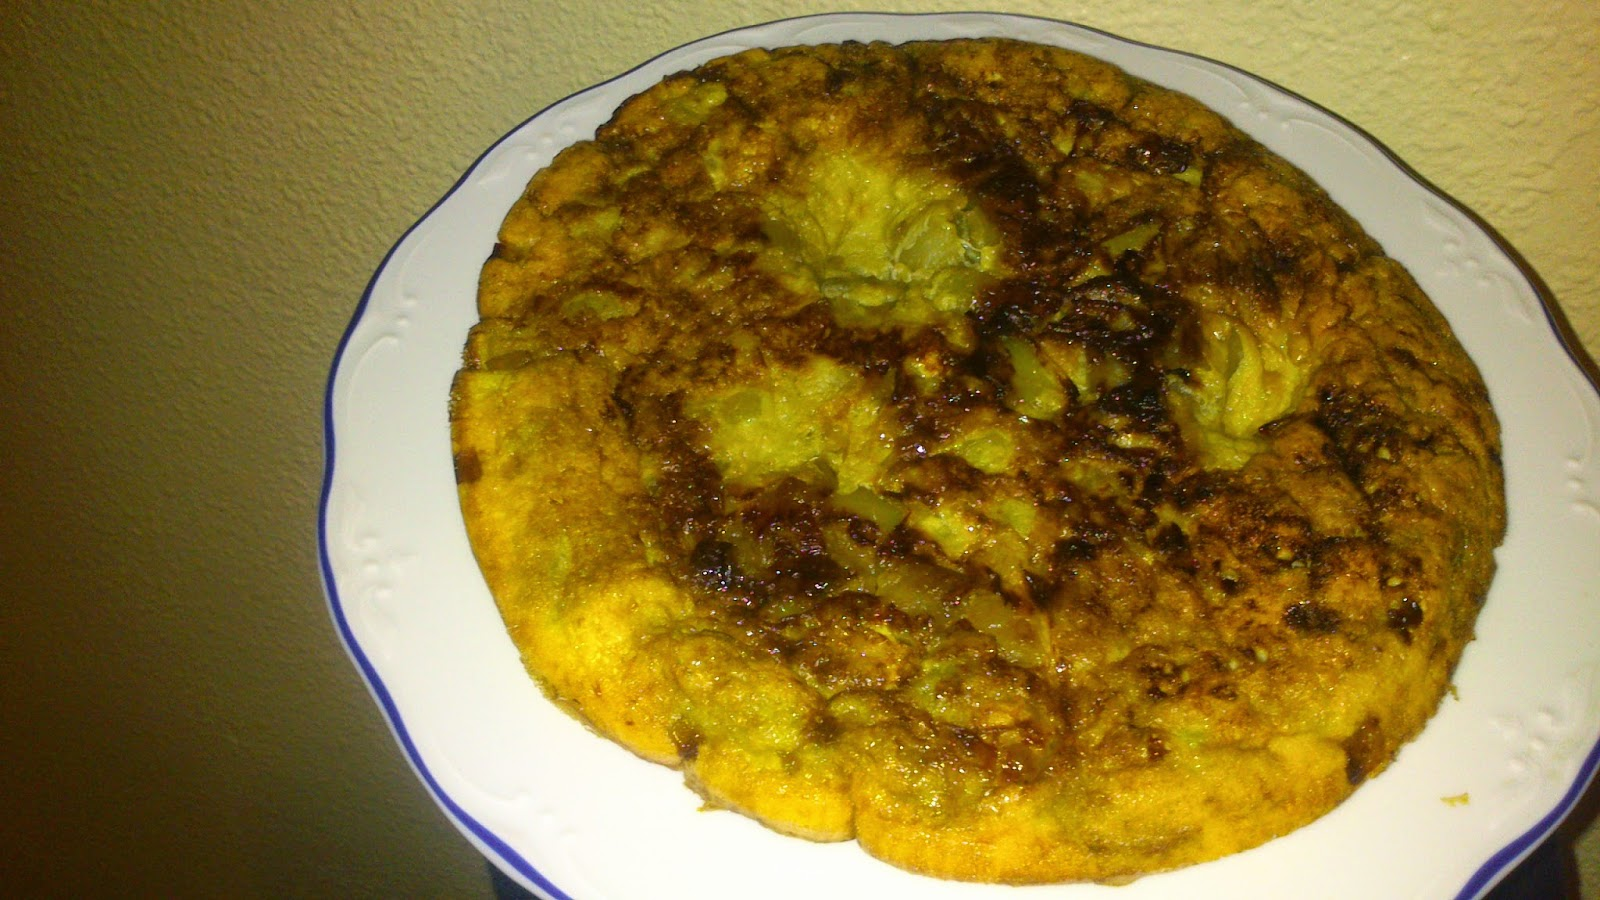 Cocina facil tortilla con calabac n berenjena y cebolla - Tortilla de calabacin y cebolla ...